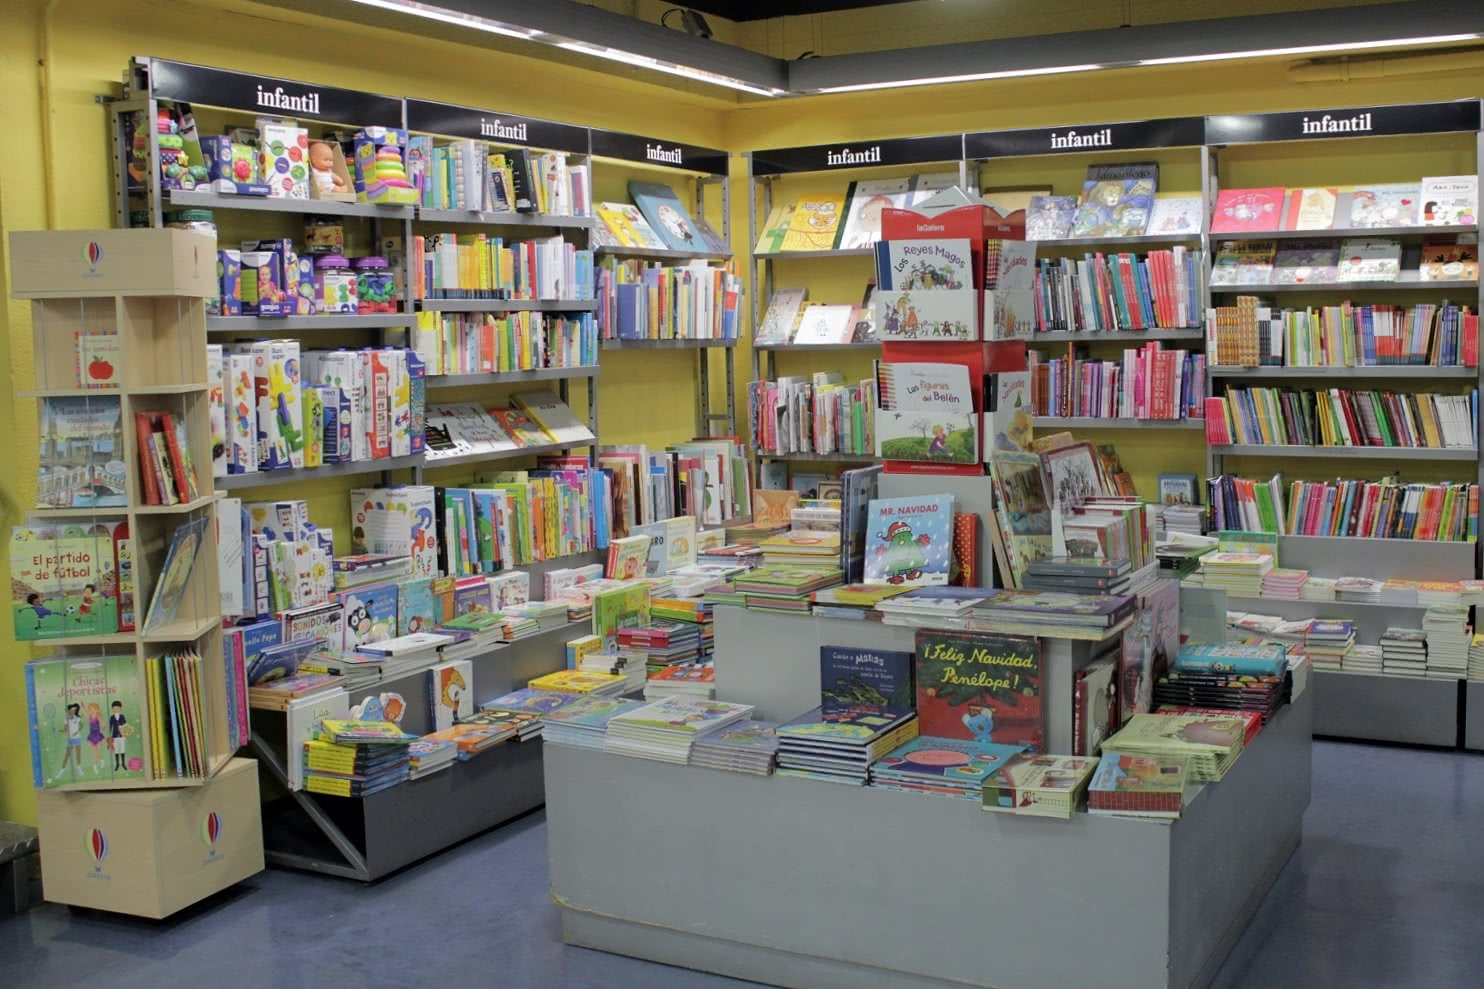 Libros infantiles. Foto: Sonia Aguilera